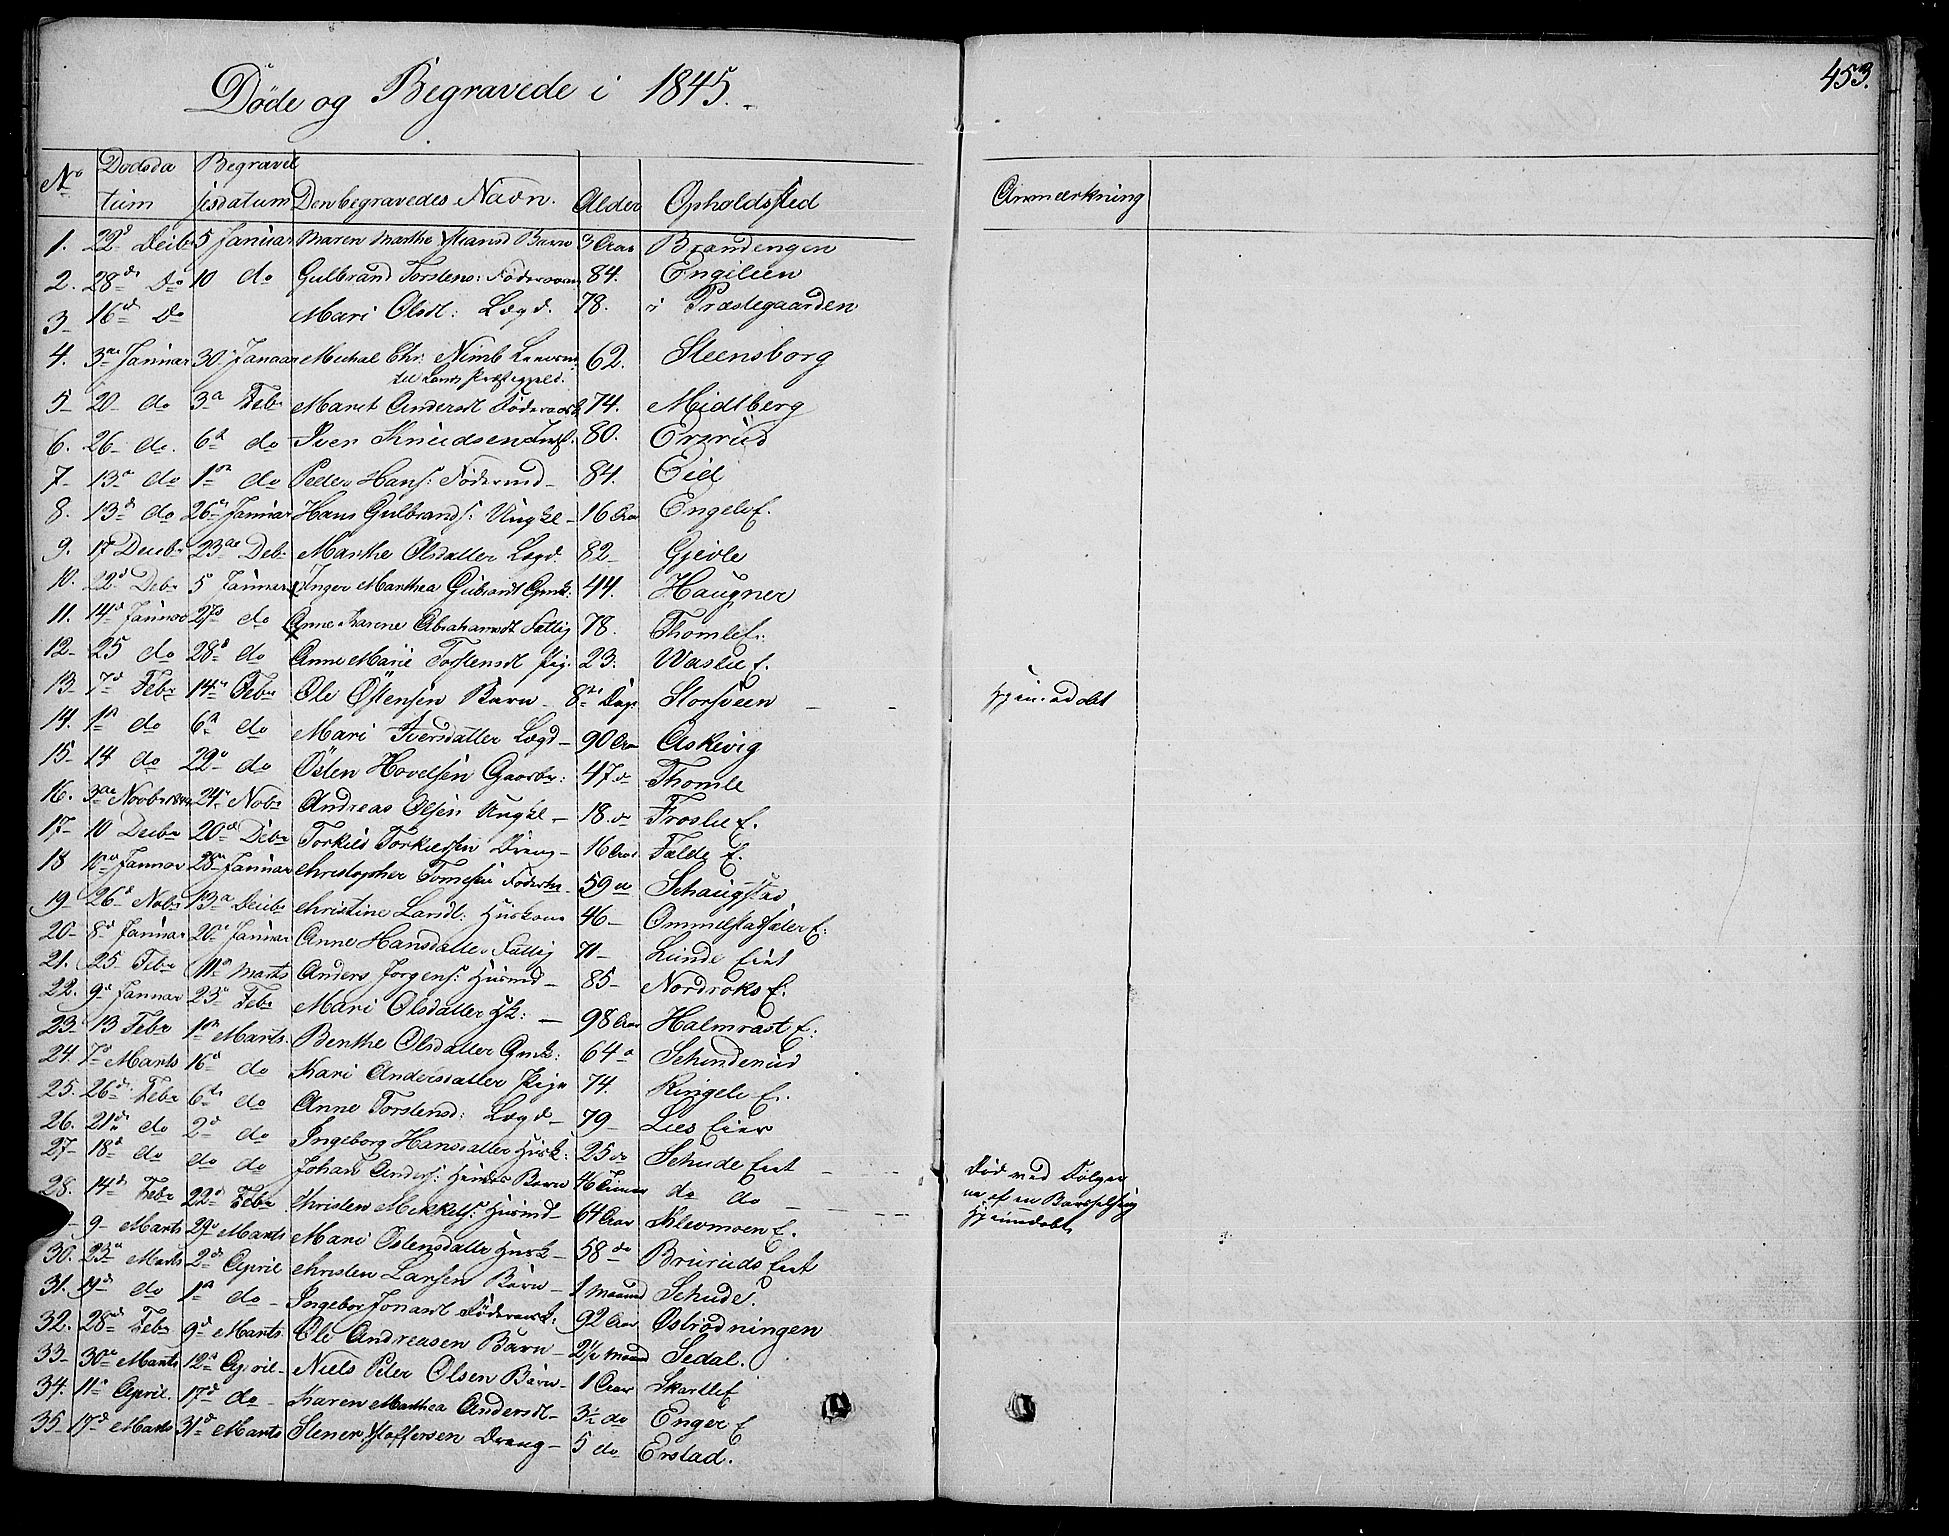 SAH, Land prestekontor, Ministerialbok nr. 8, 1830-1846, s. 453